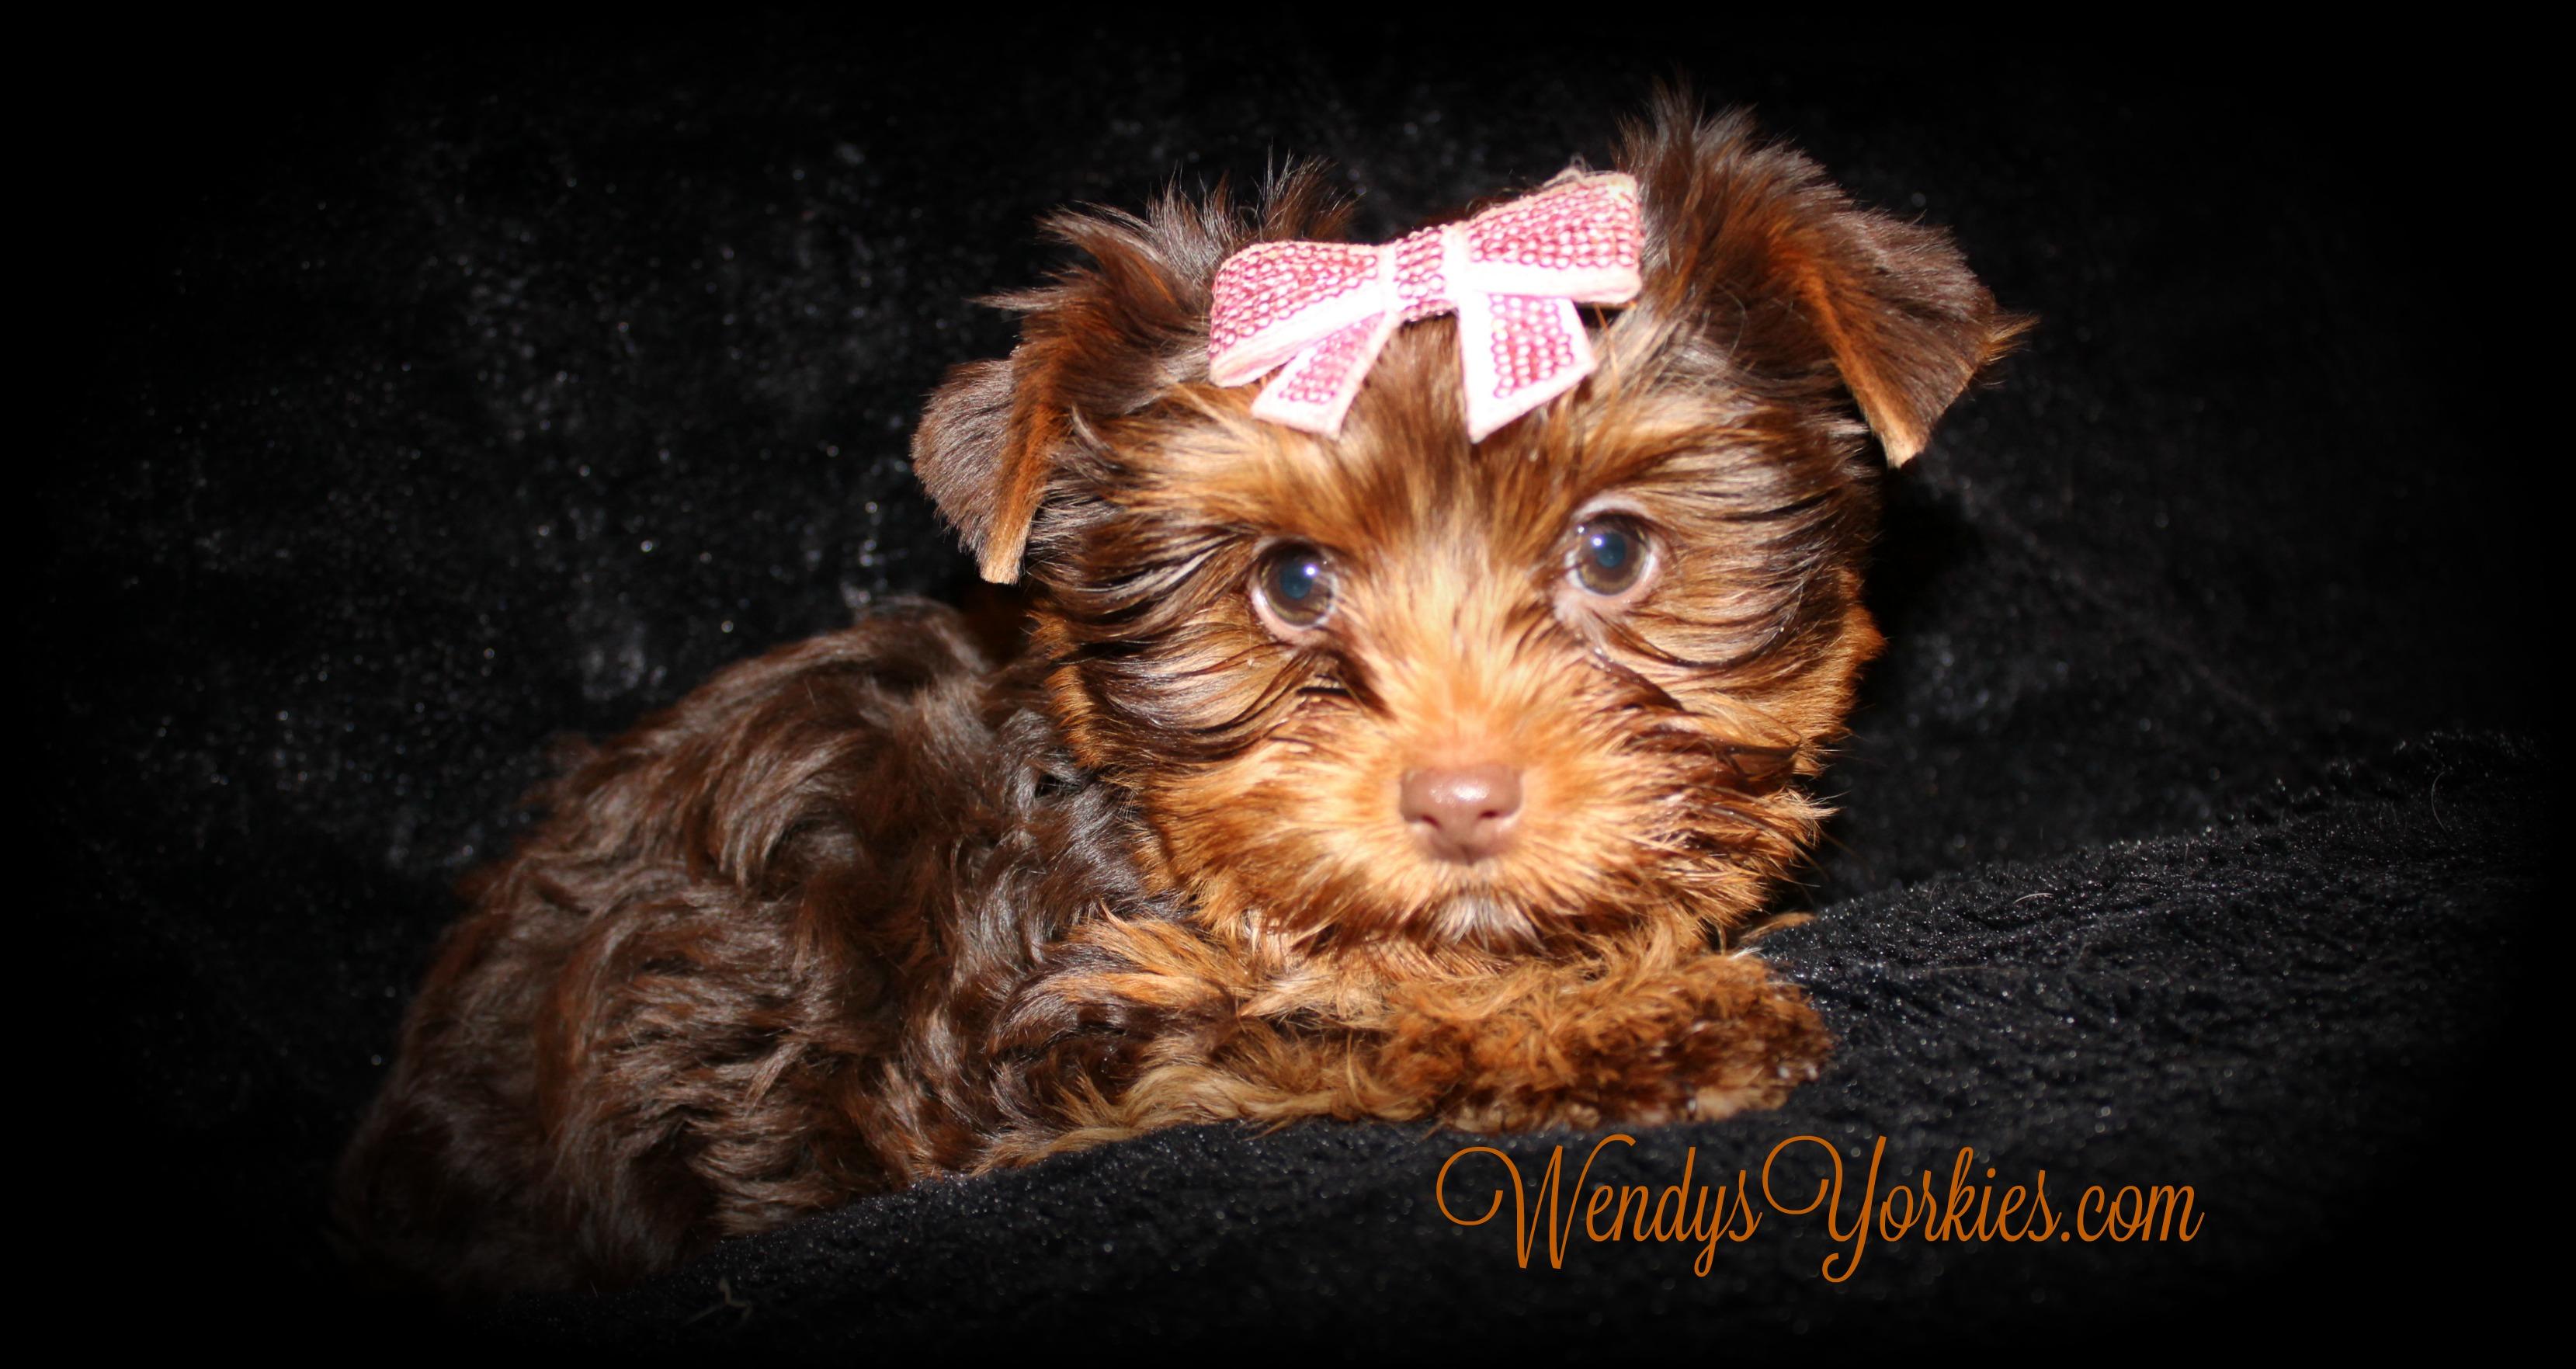 Chocolate Yorkie female puppy for sale, WendysYOrkies.com, Lela fc1